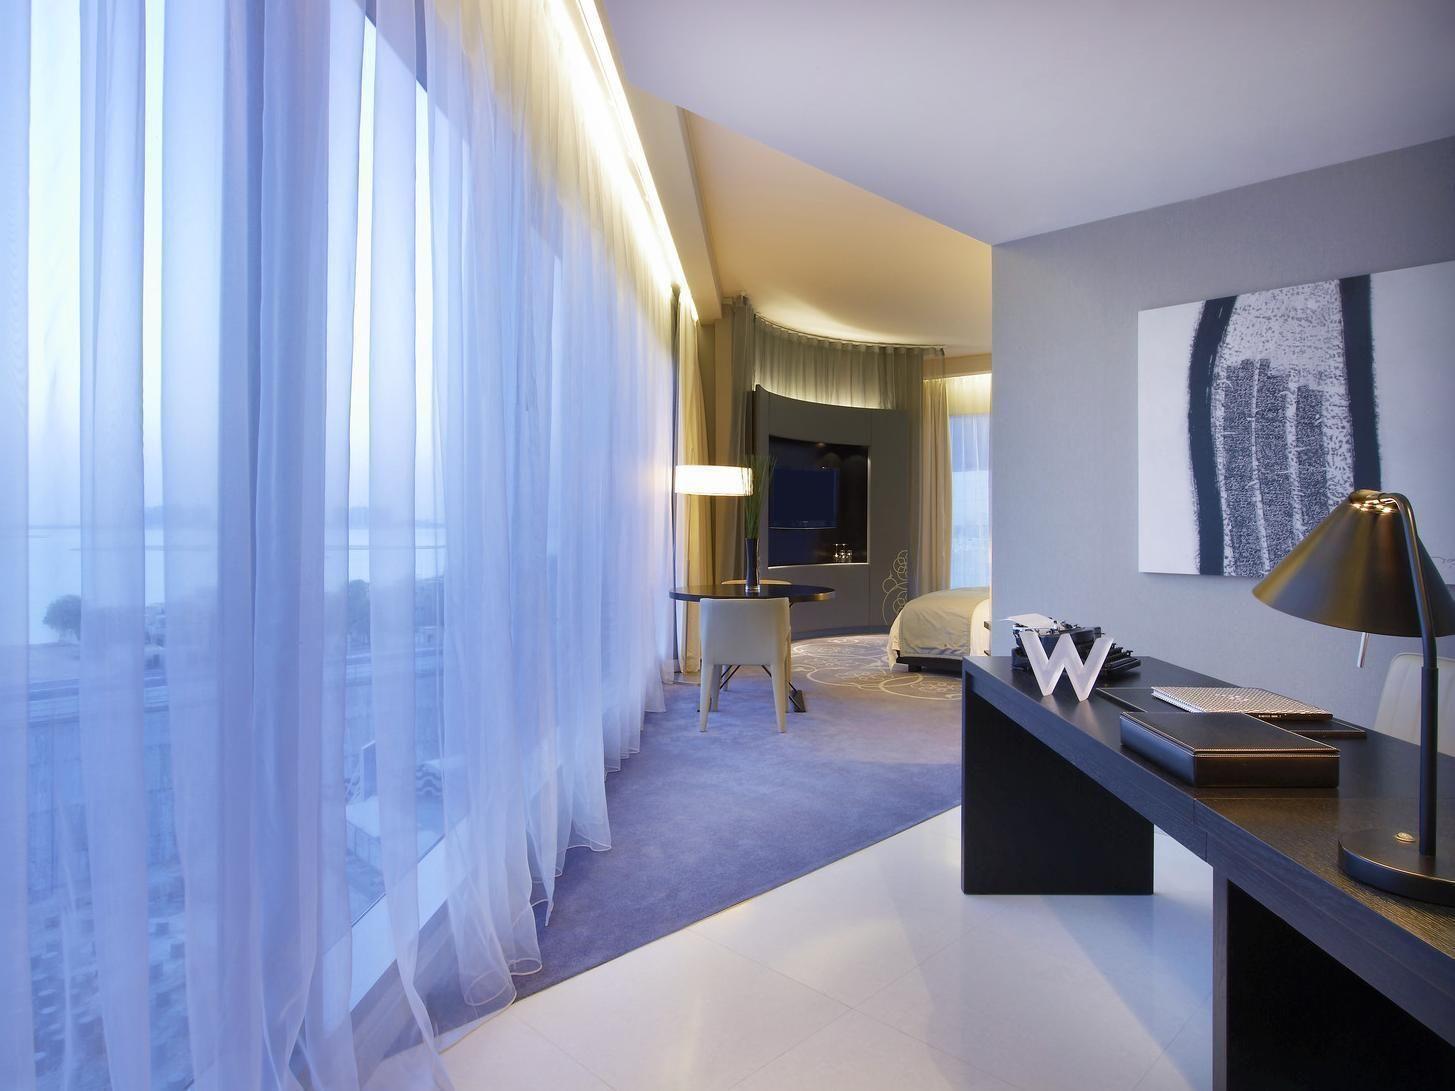 W Doha Hotel and Residences Doha, Qatar